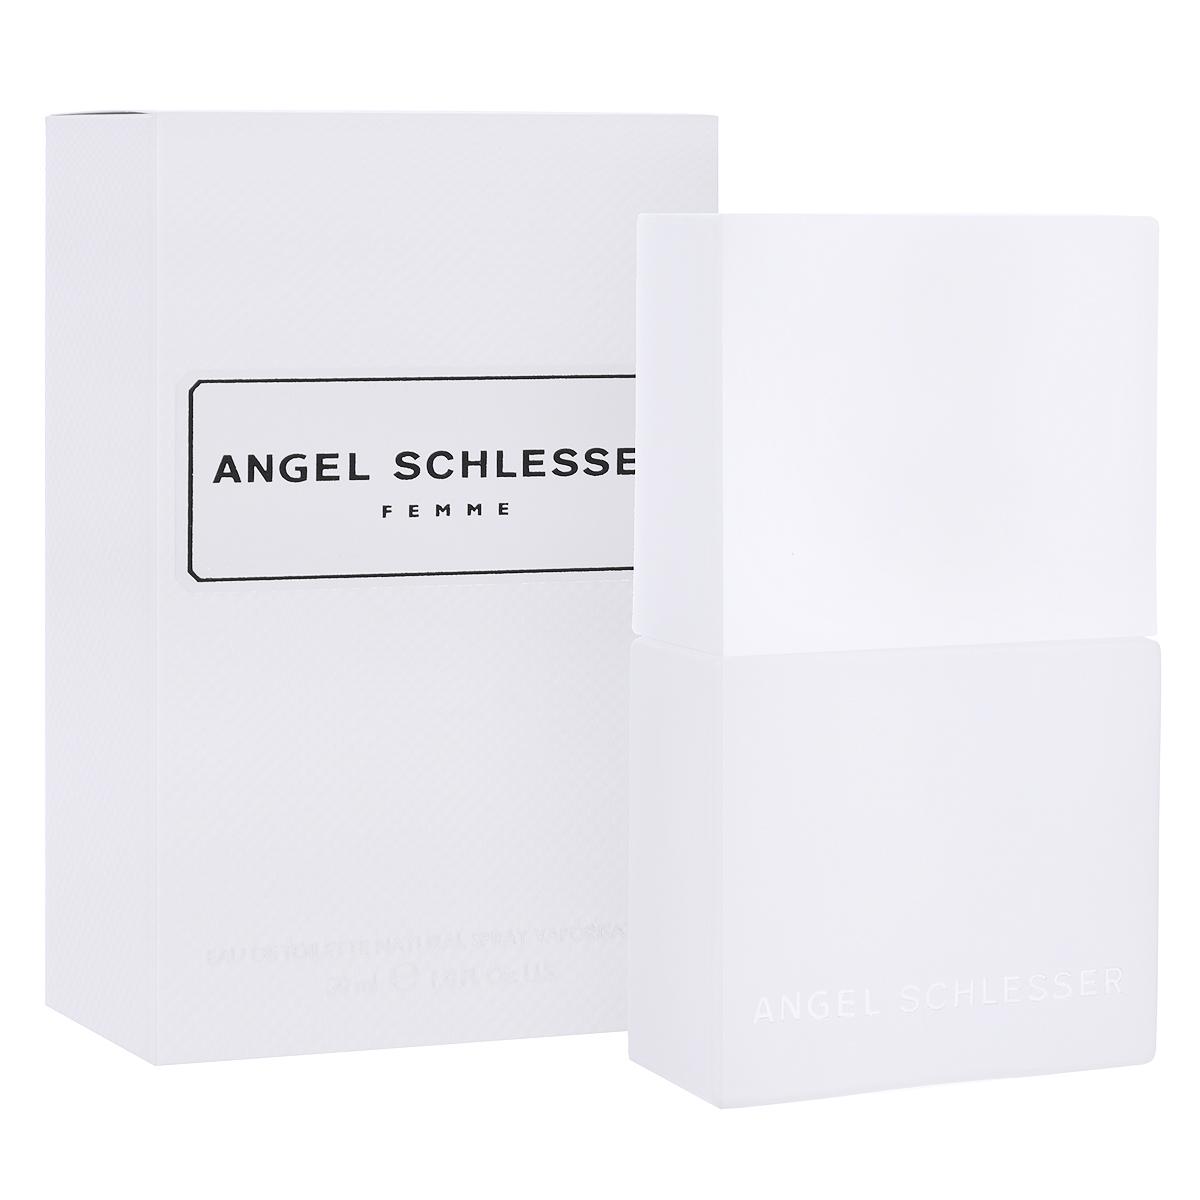 Angel Schlesser Туалетная вода Femme, женская, 30 мл44959